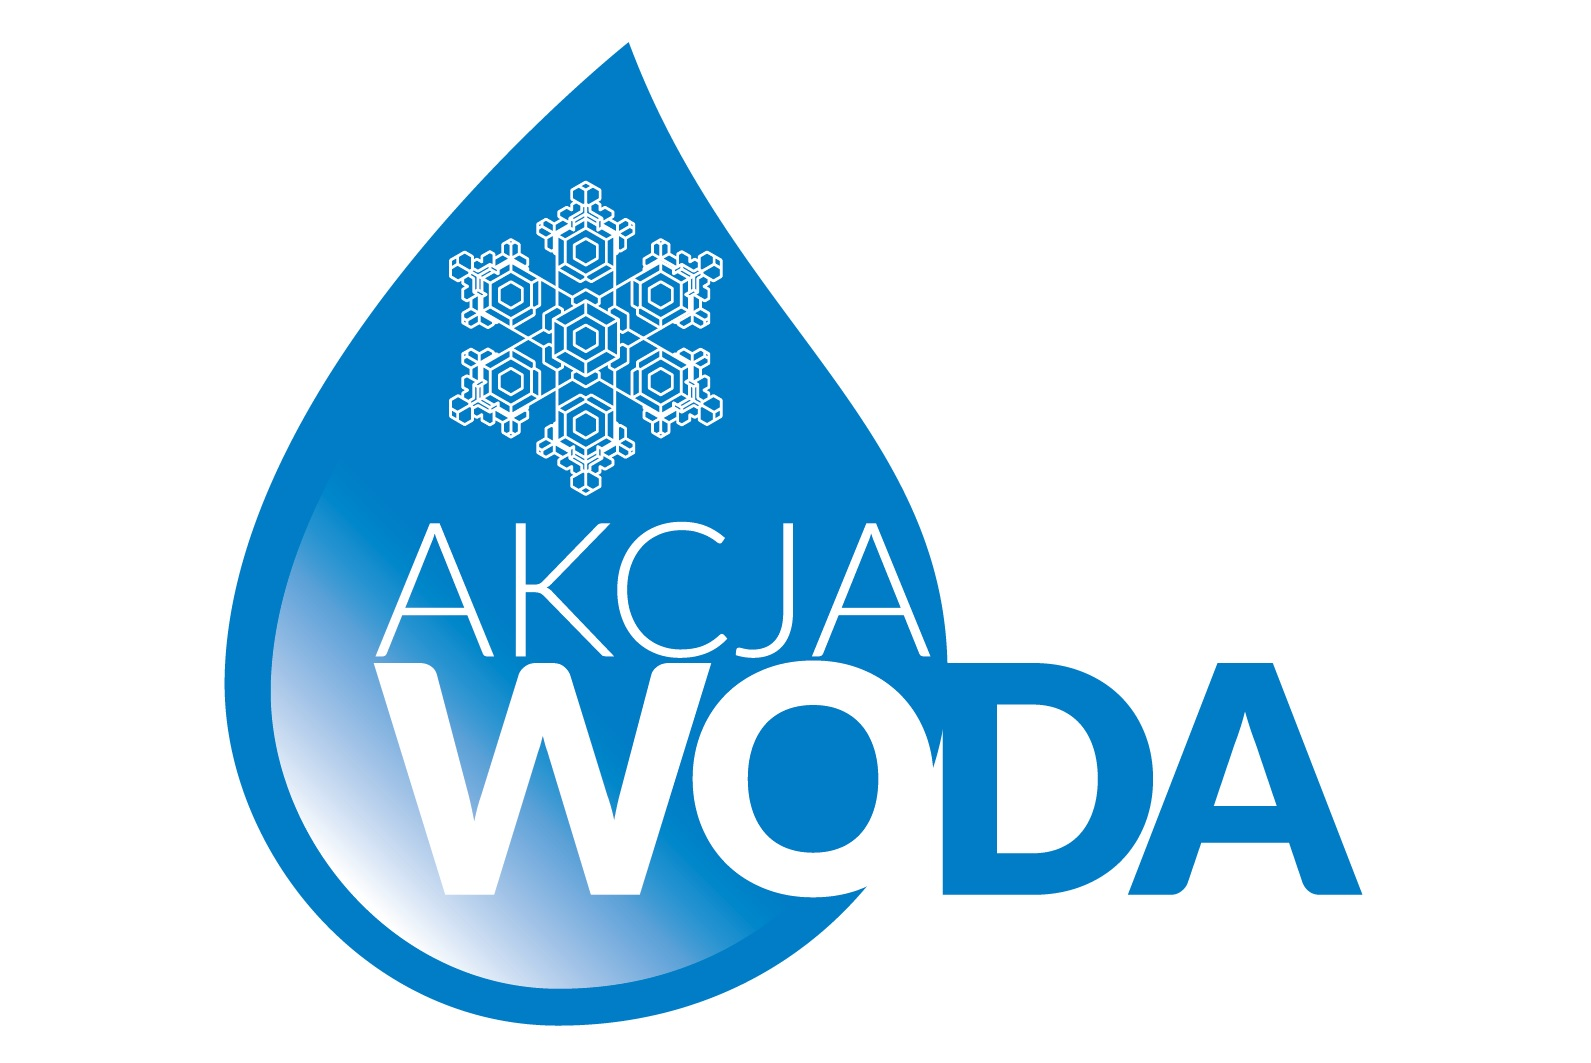 https://m.wm.pl/2021/03/orig/akcja-woda-logo-690118.jpg